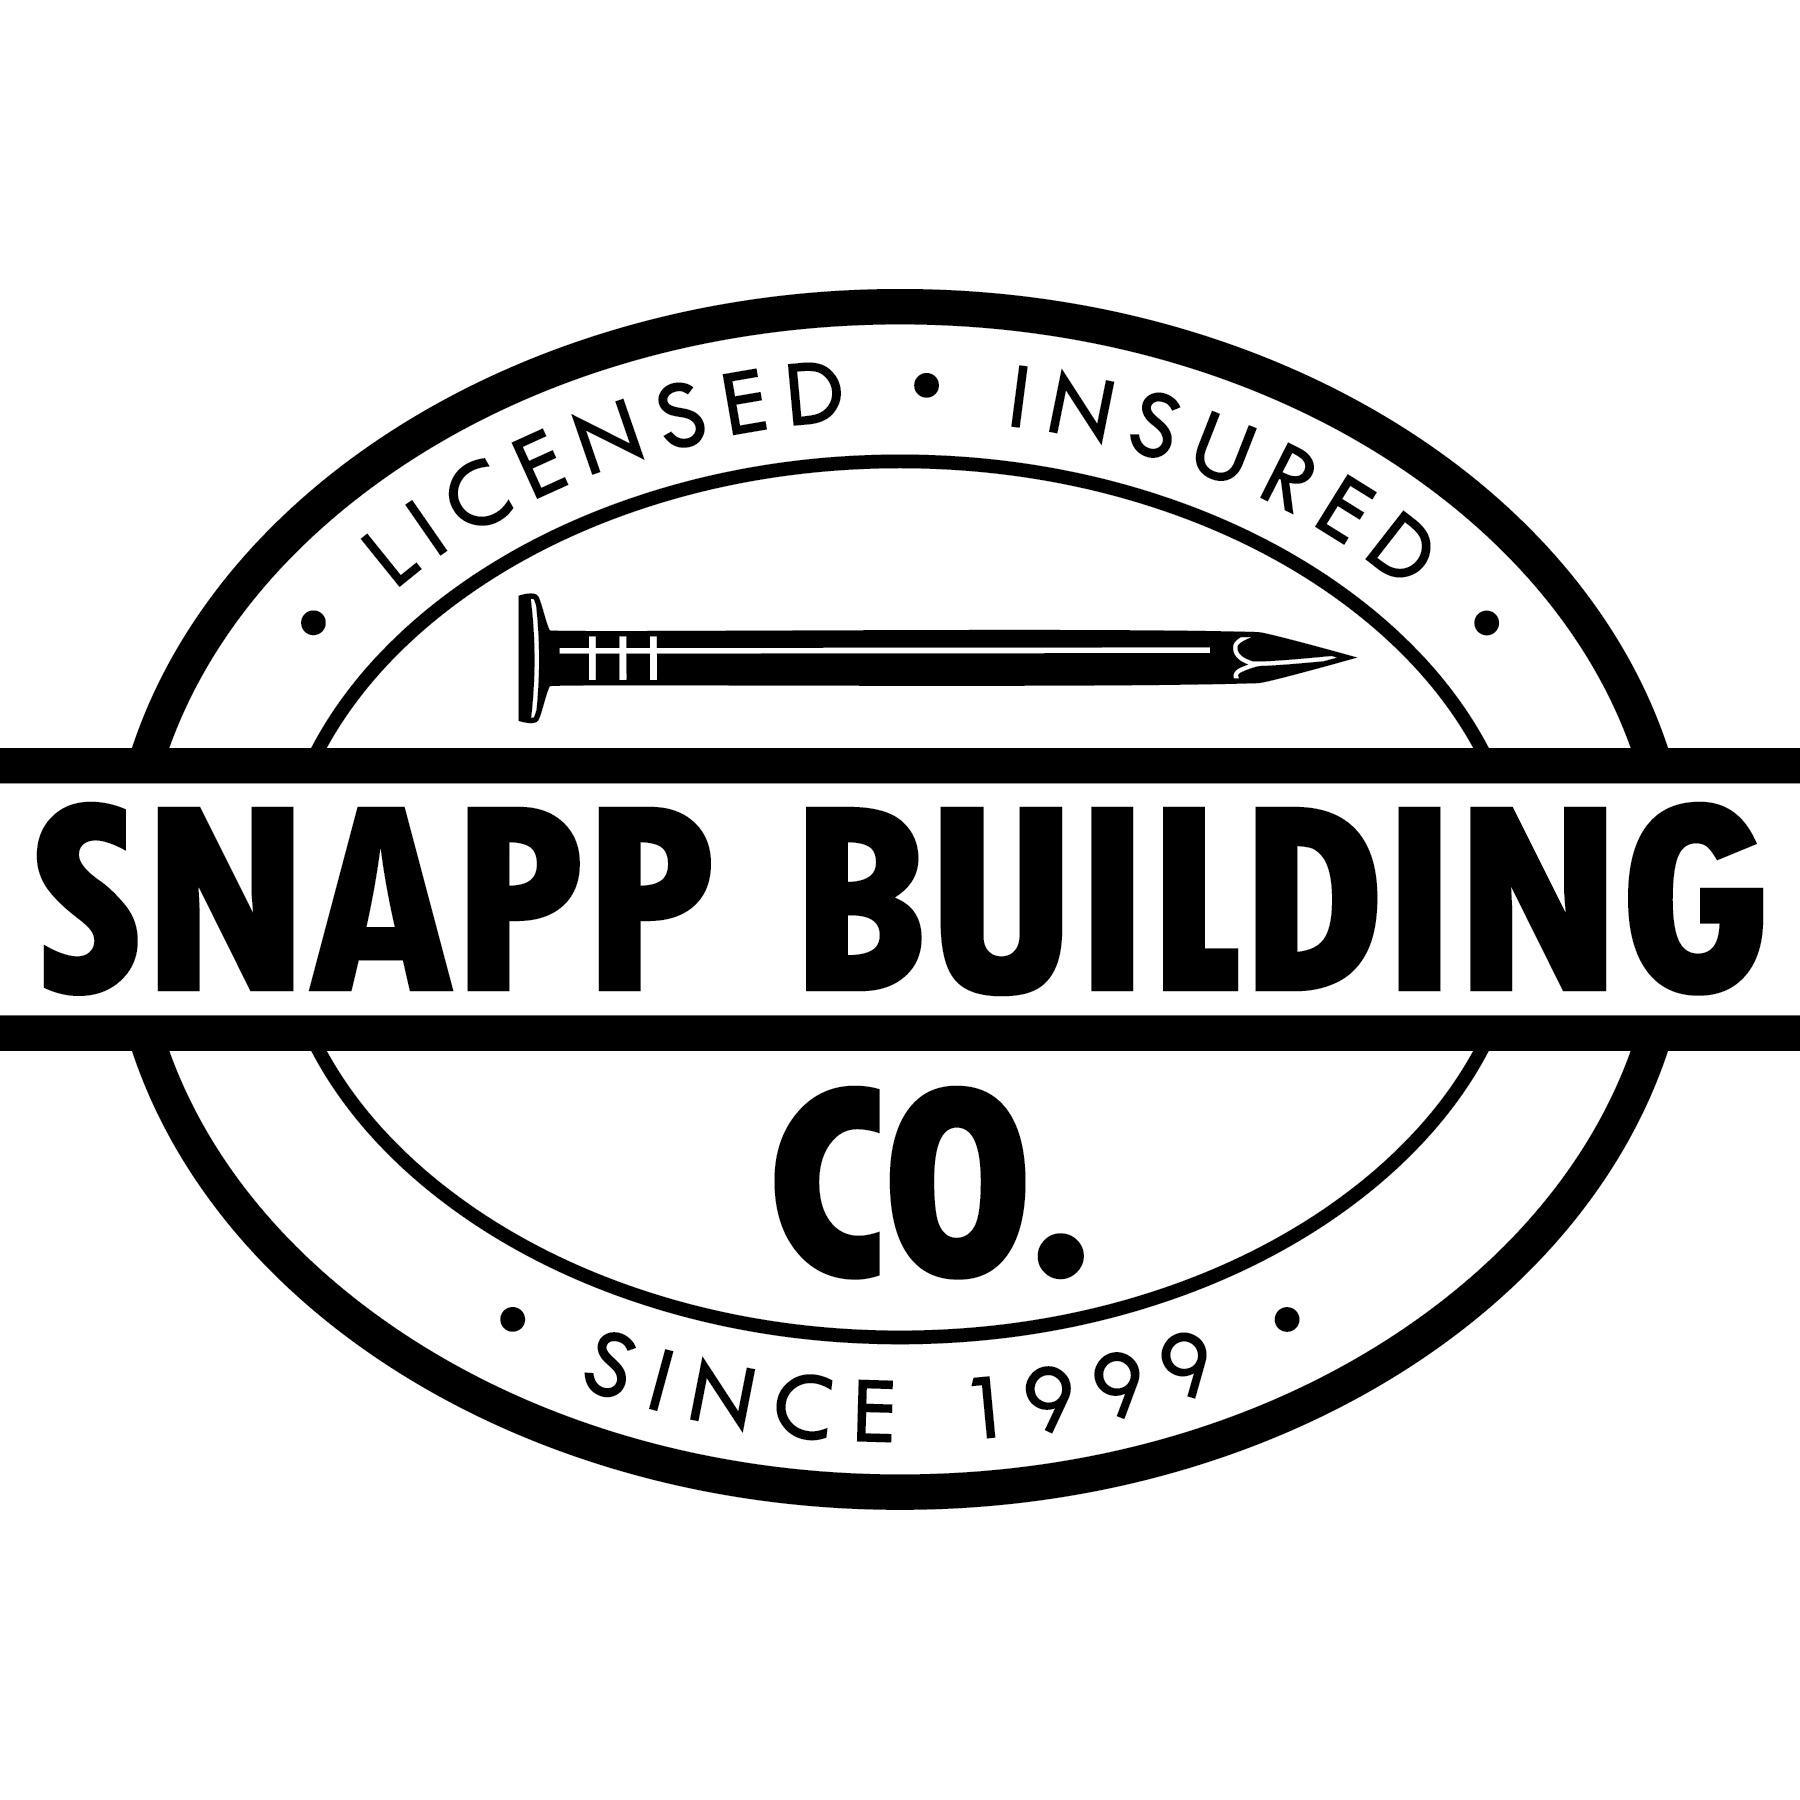 Snapp Building Co - Marquette, MI 49855 - (906)869-3944 | ShowMeLocal.com